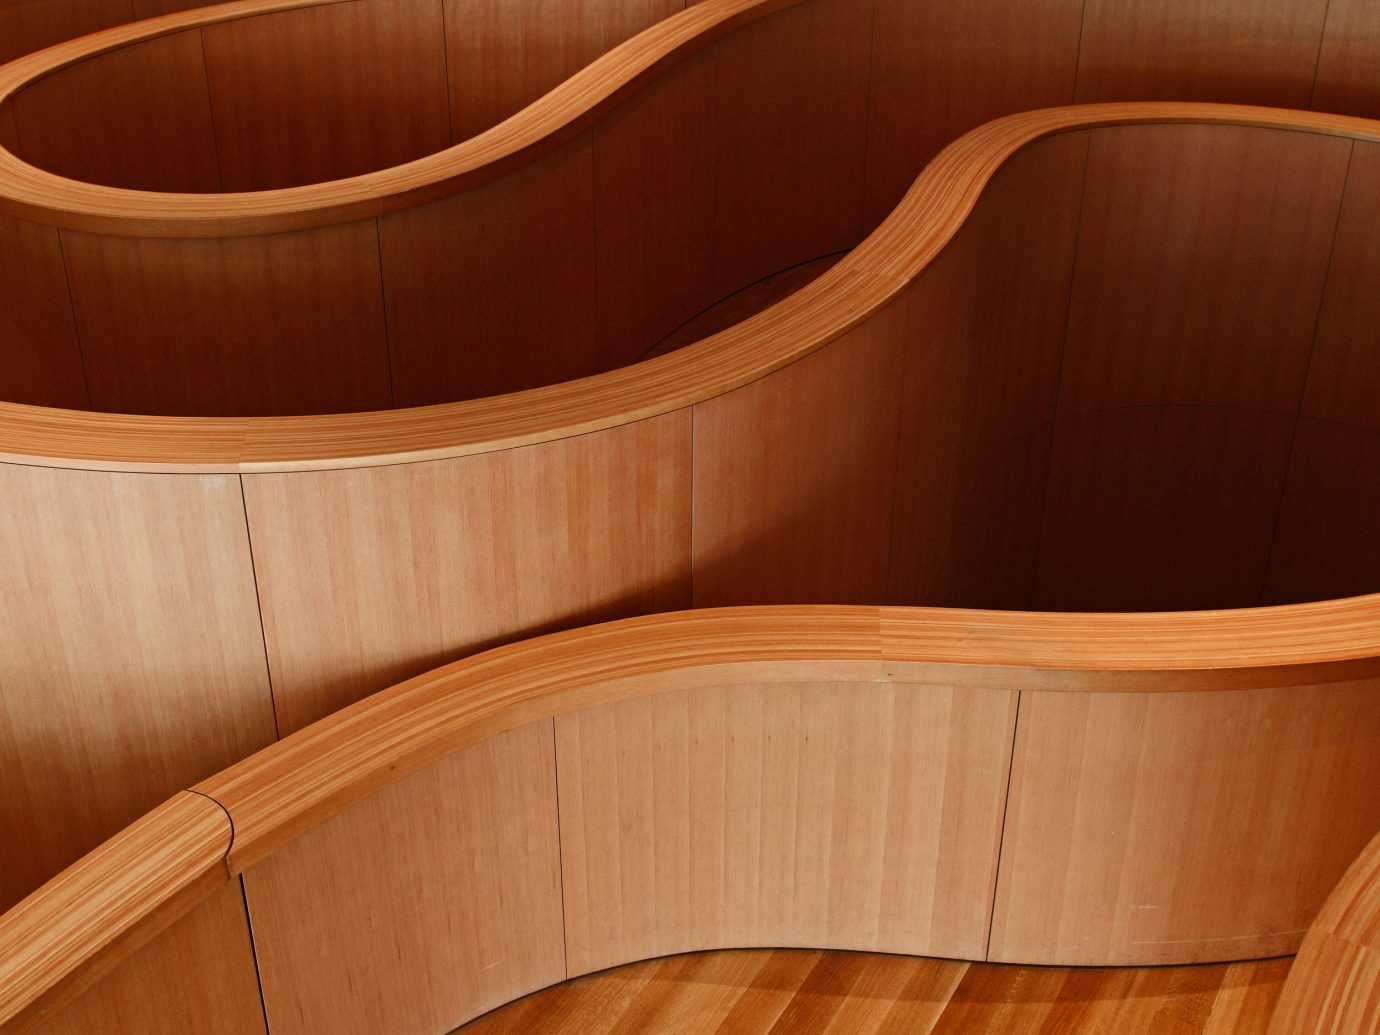 Trip Ideas indoor man made object furniture wood hardwood wooden floor wood stain plucked string instruments wood flooring table guitar tub bathtub bowl